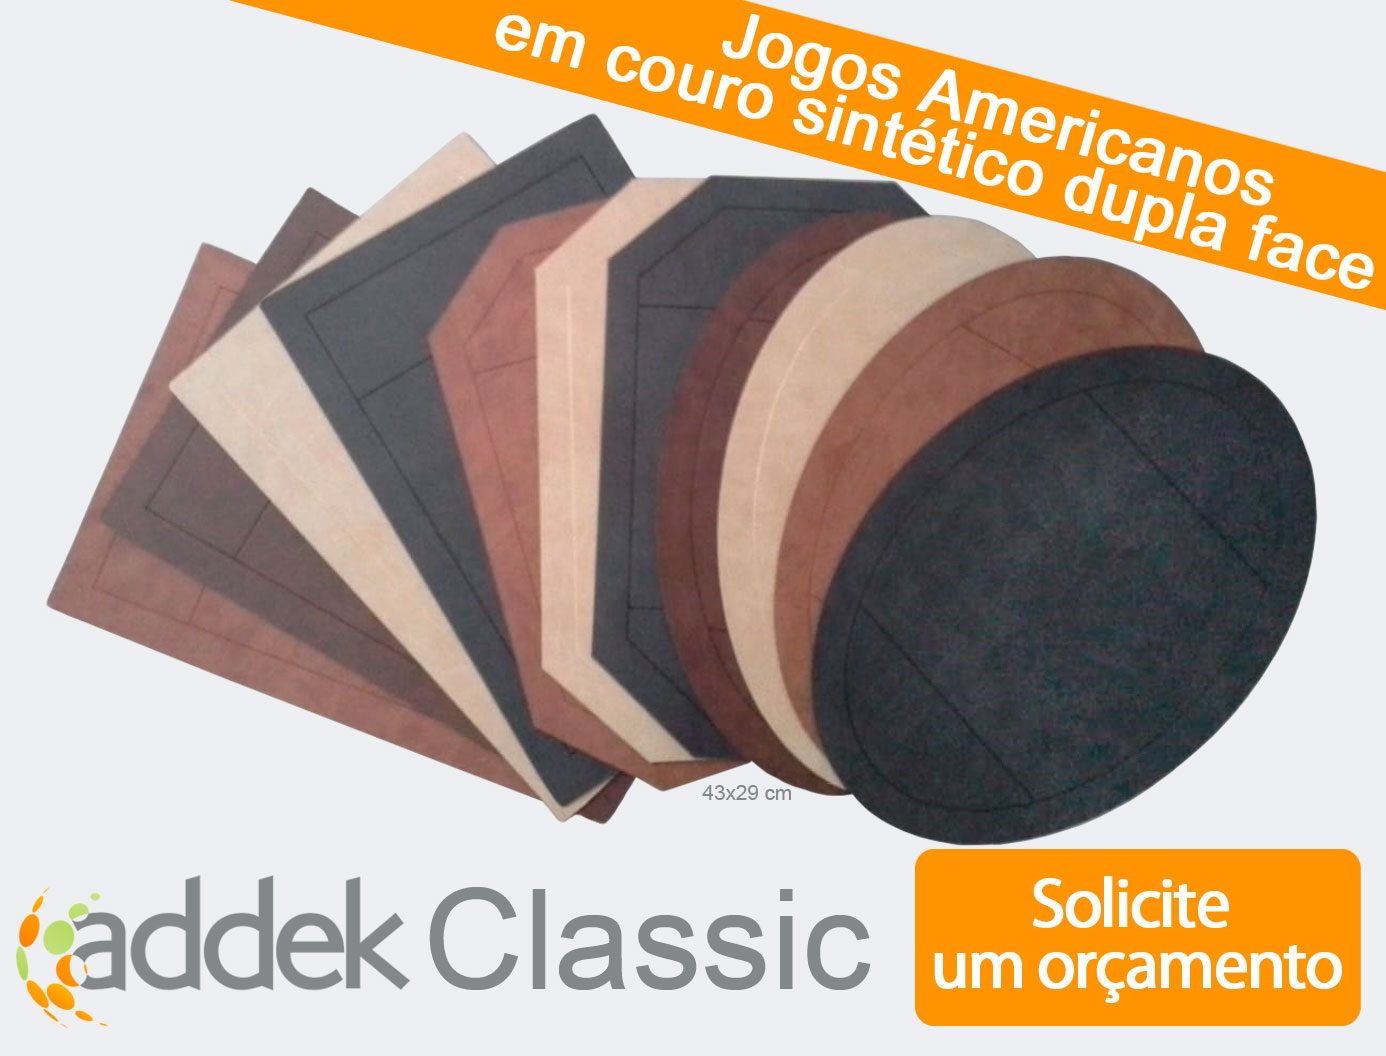 Addek-Classic-Jogo-Americano